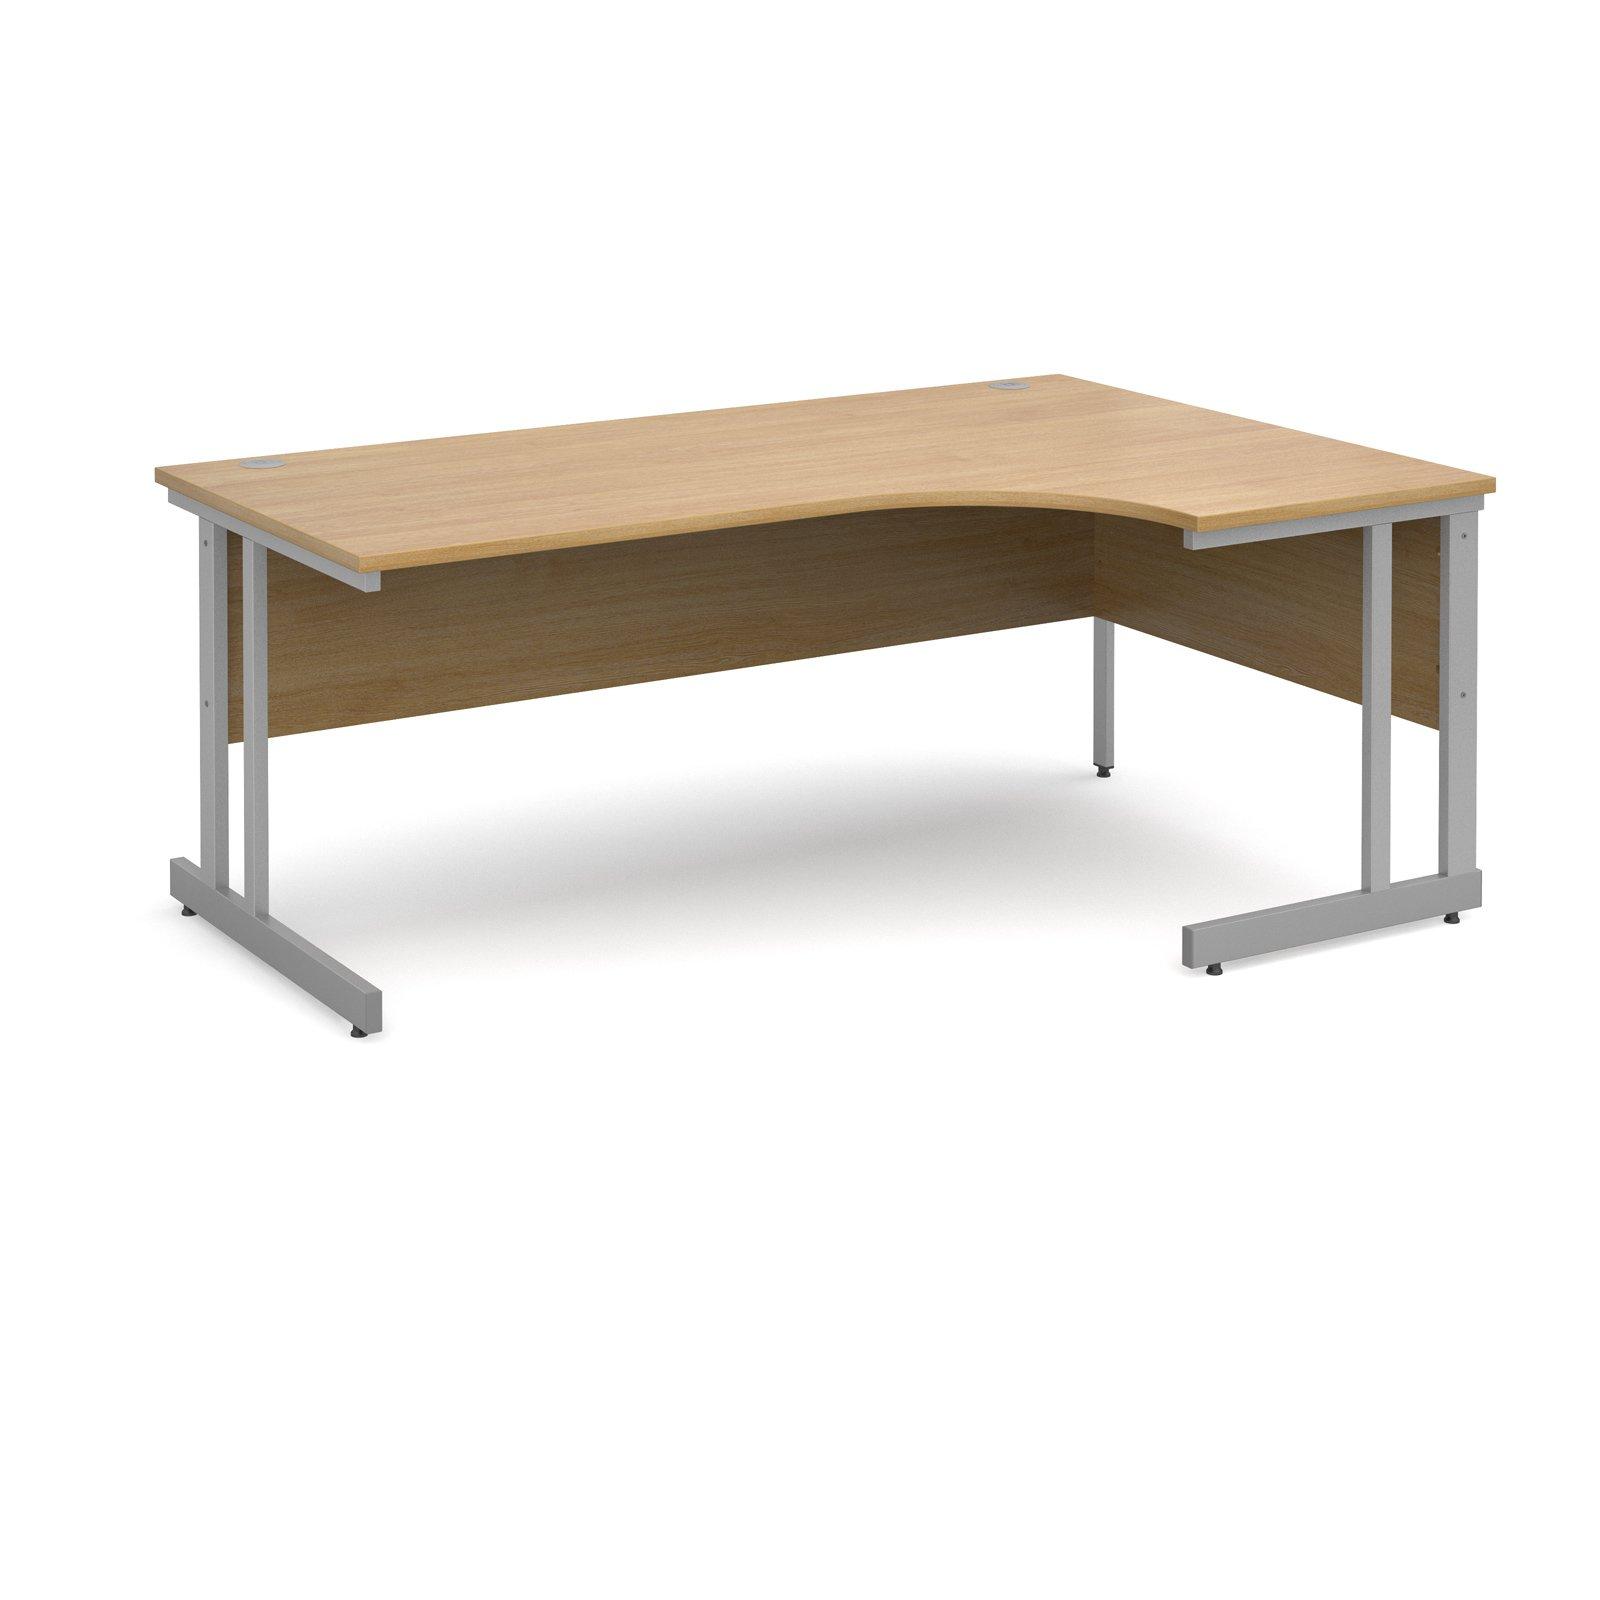 Momento right hand ergonomic desk 1800mm - silver cantilever frame, oak top